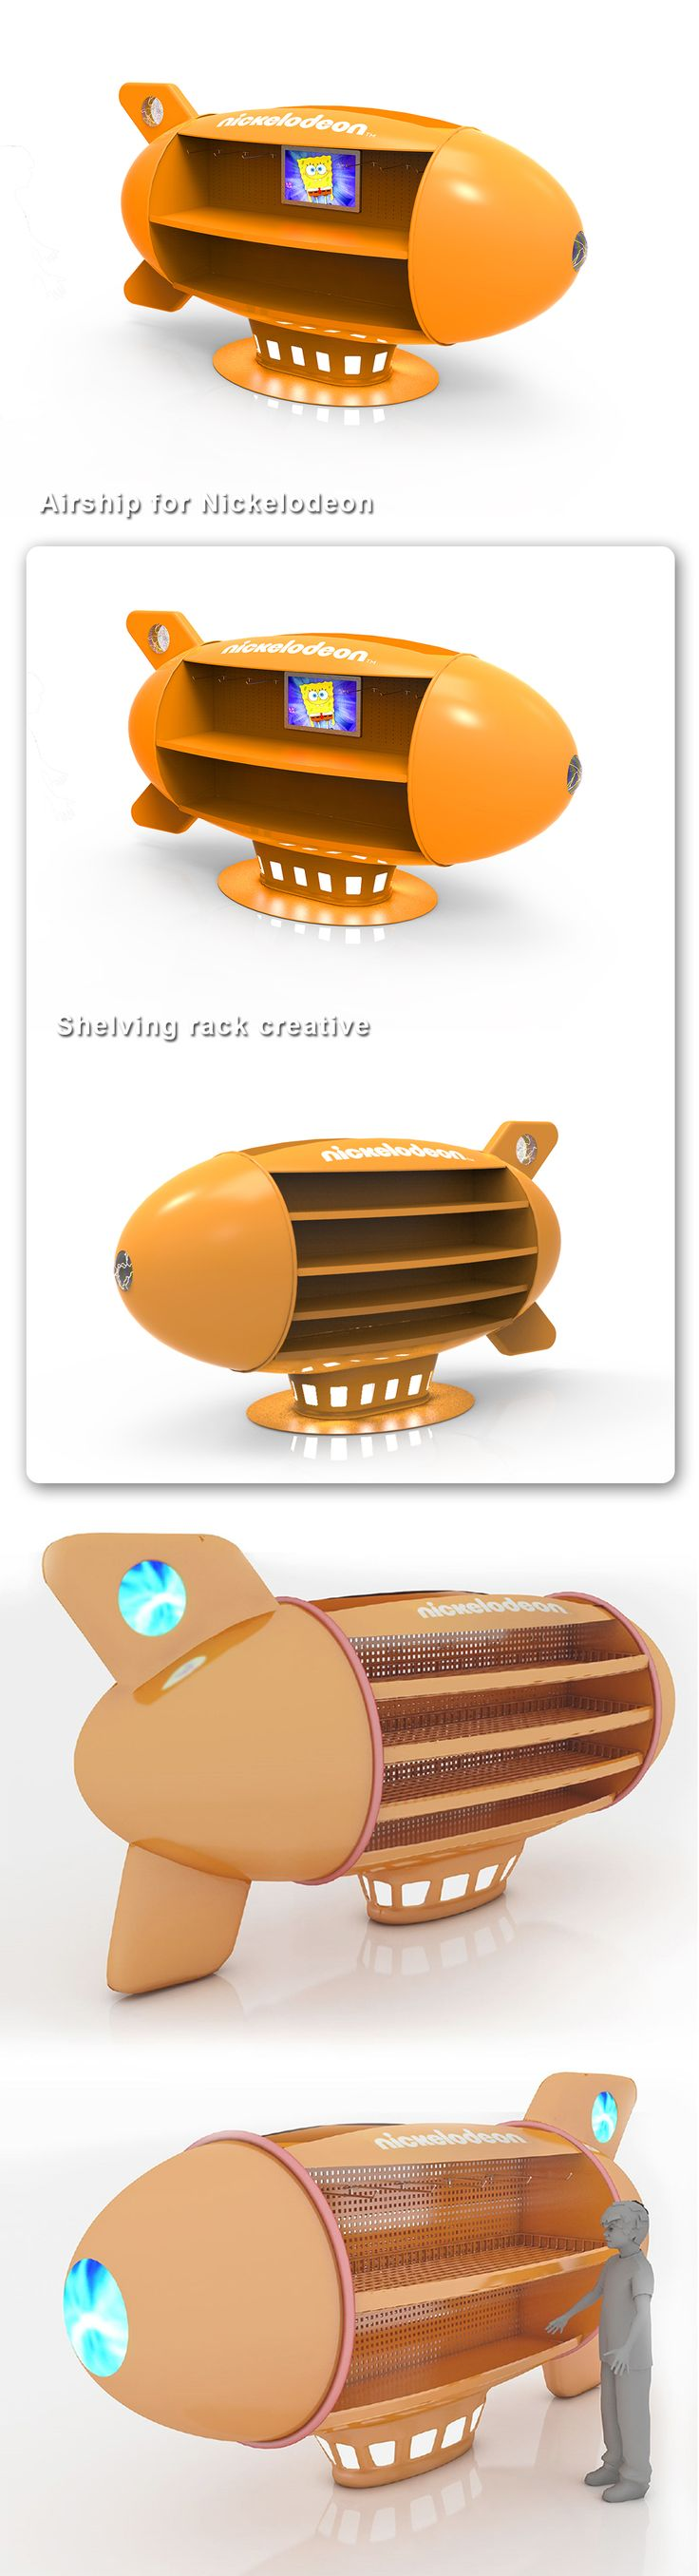 POSM Design Shelving Nickelodeon